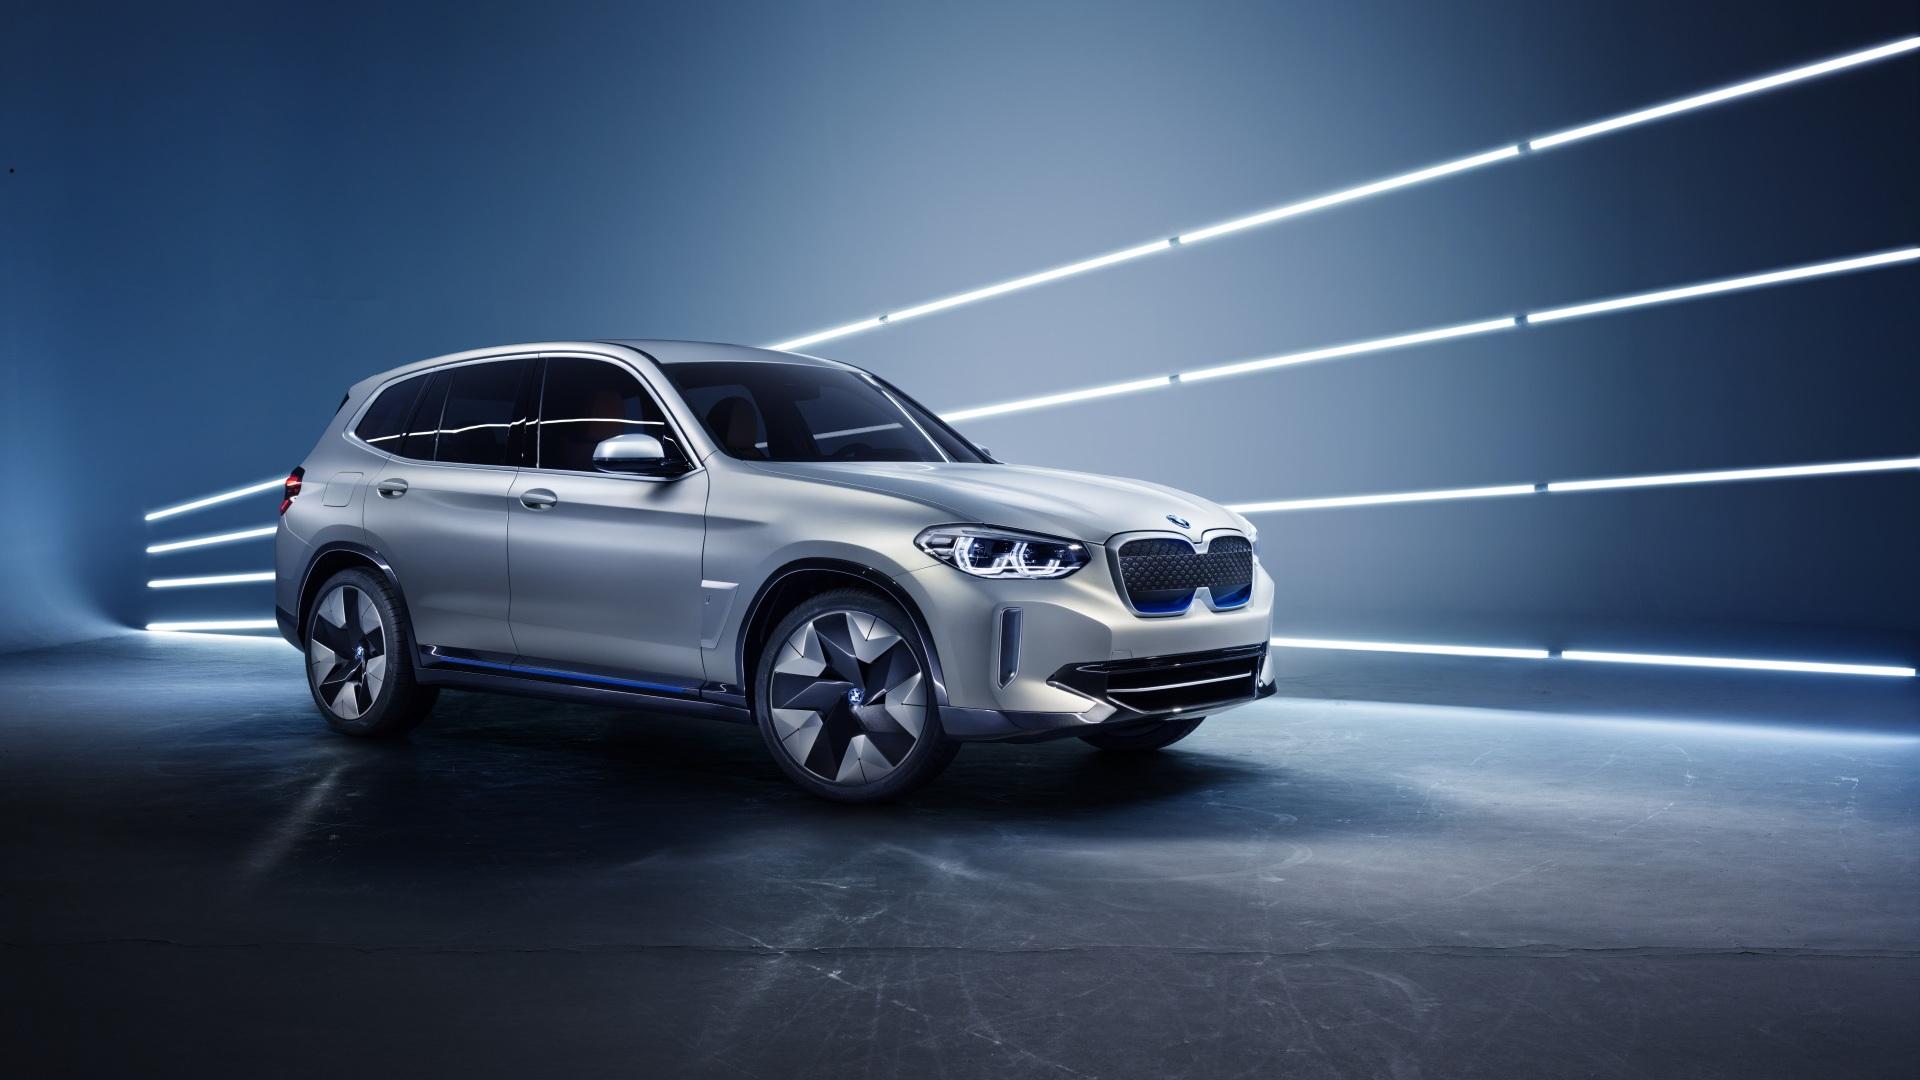 BMW iX3 Concept front 3/4